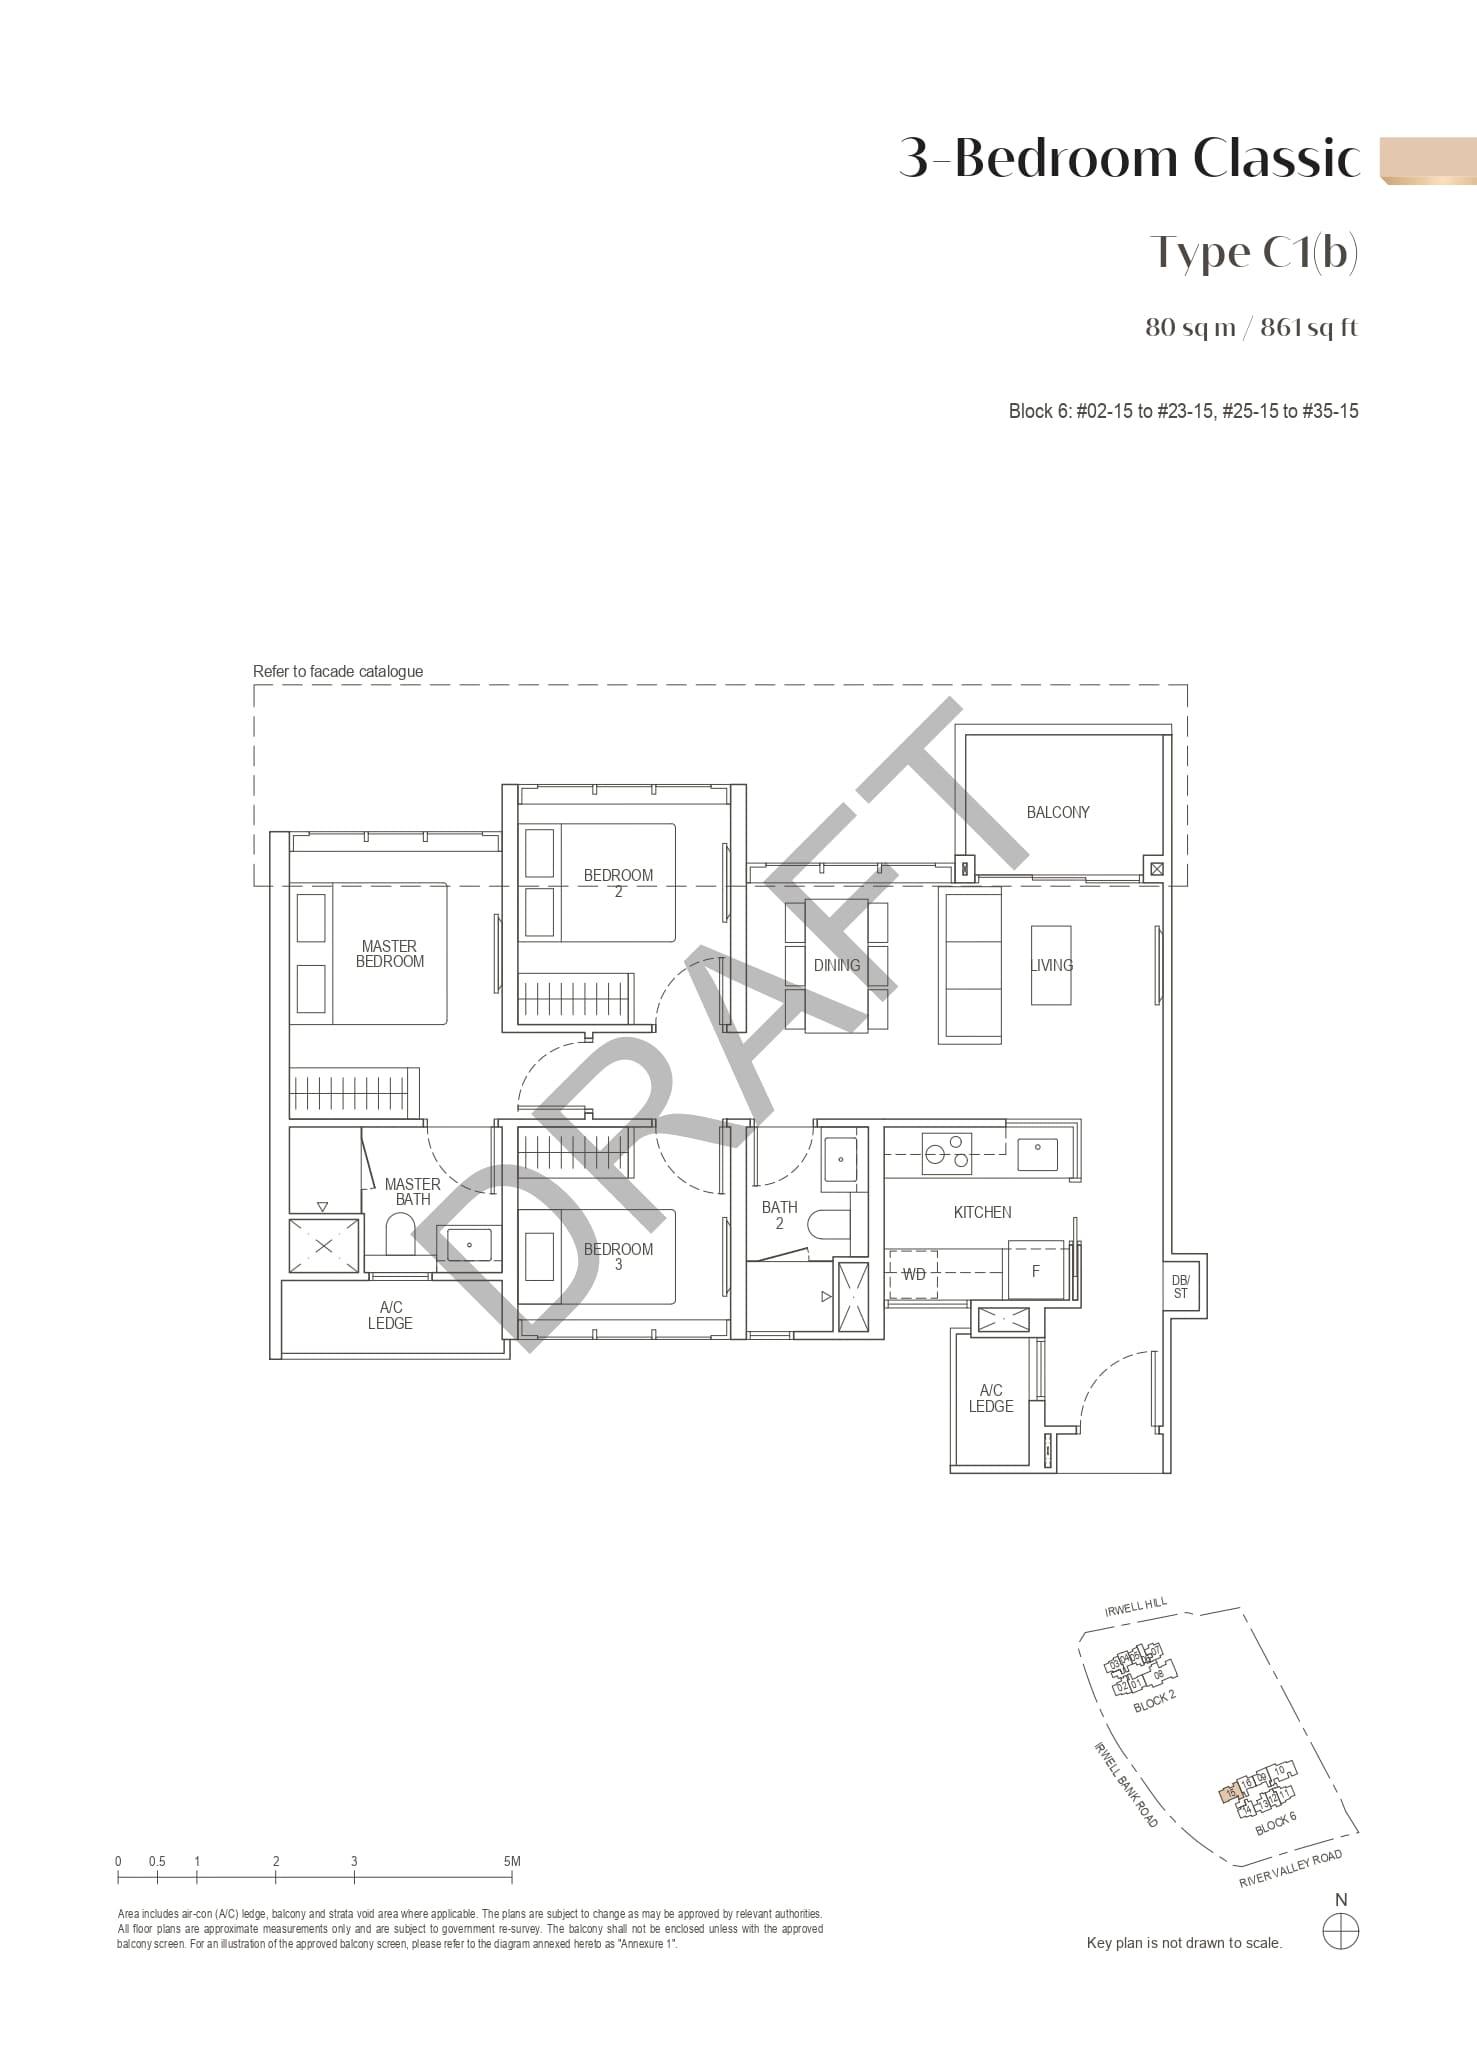 irwell-hill-residences-floor-plan-3-bedroom-classic-type-c1b